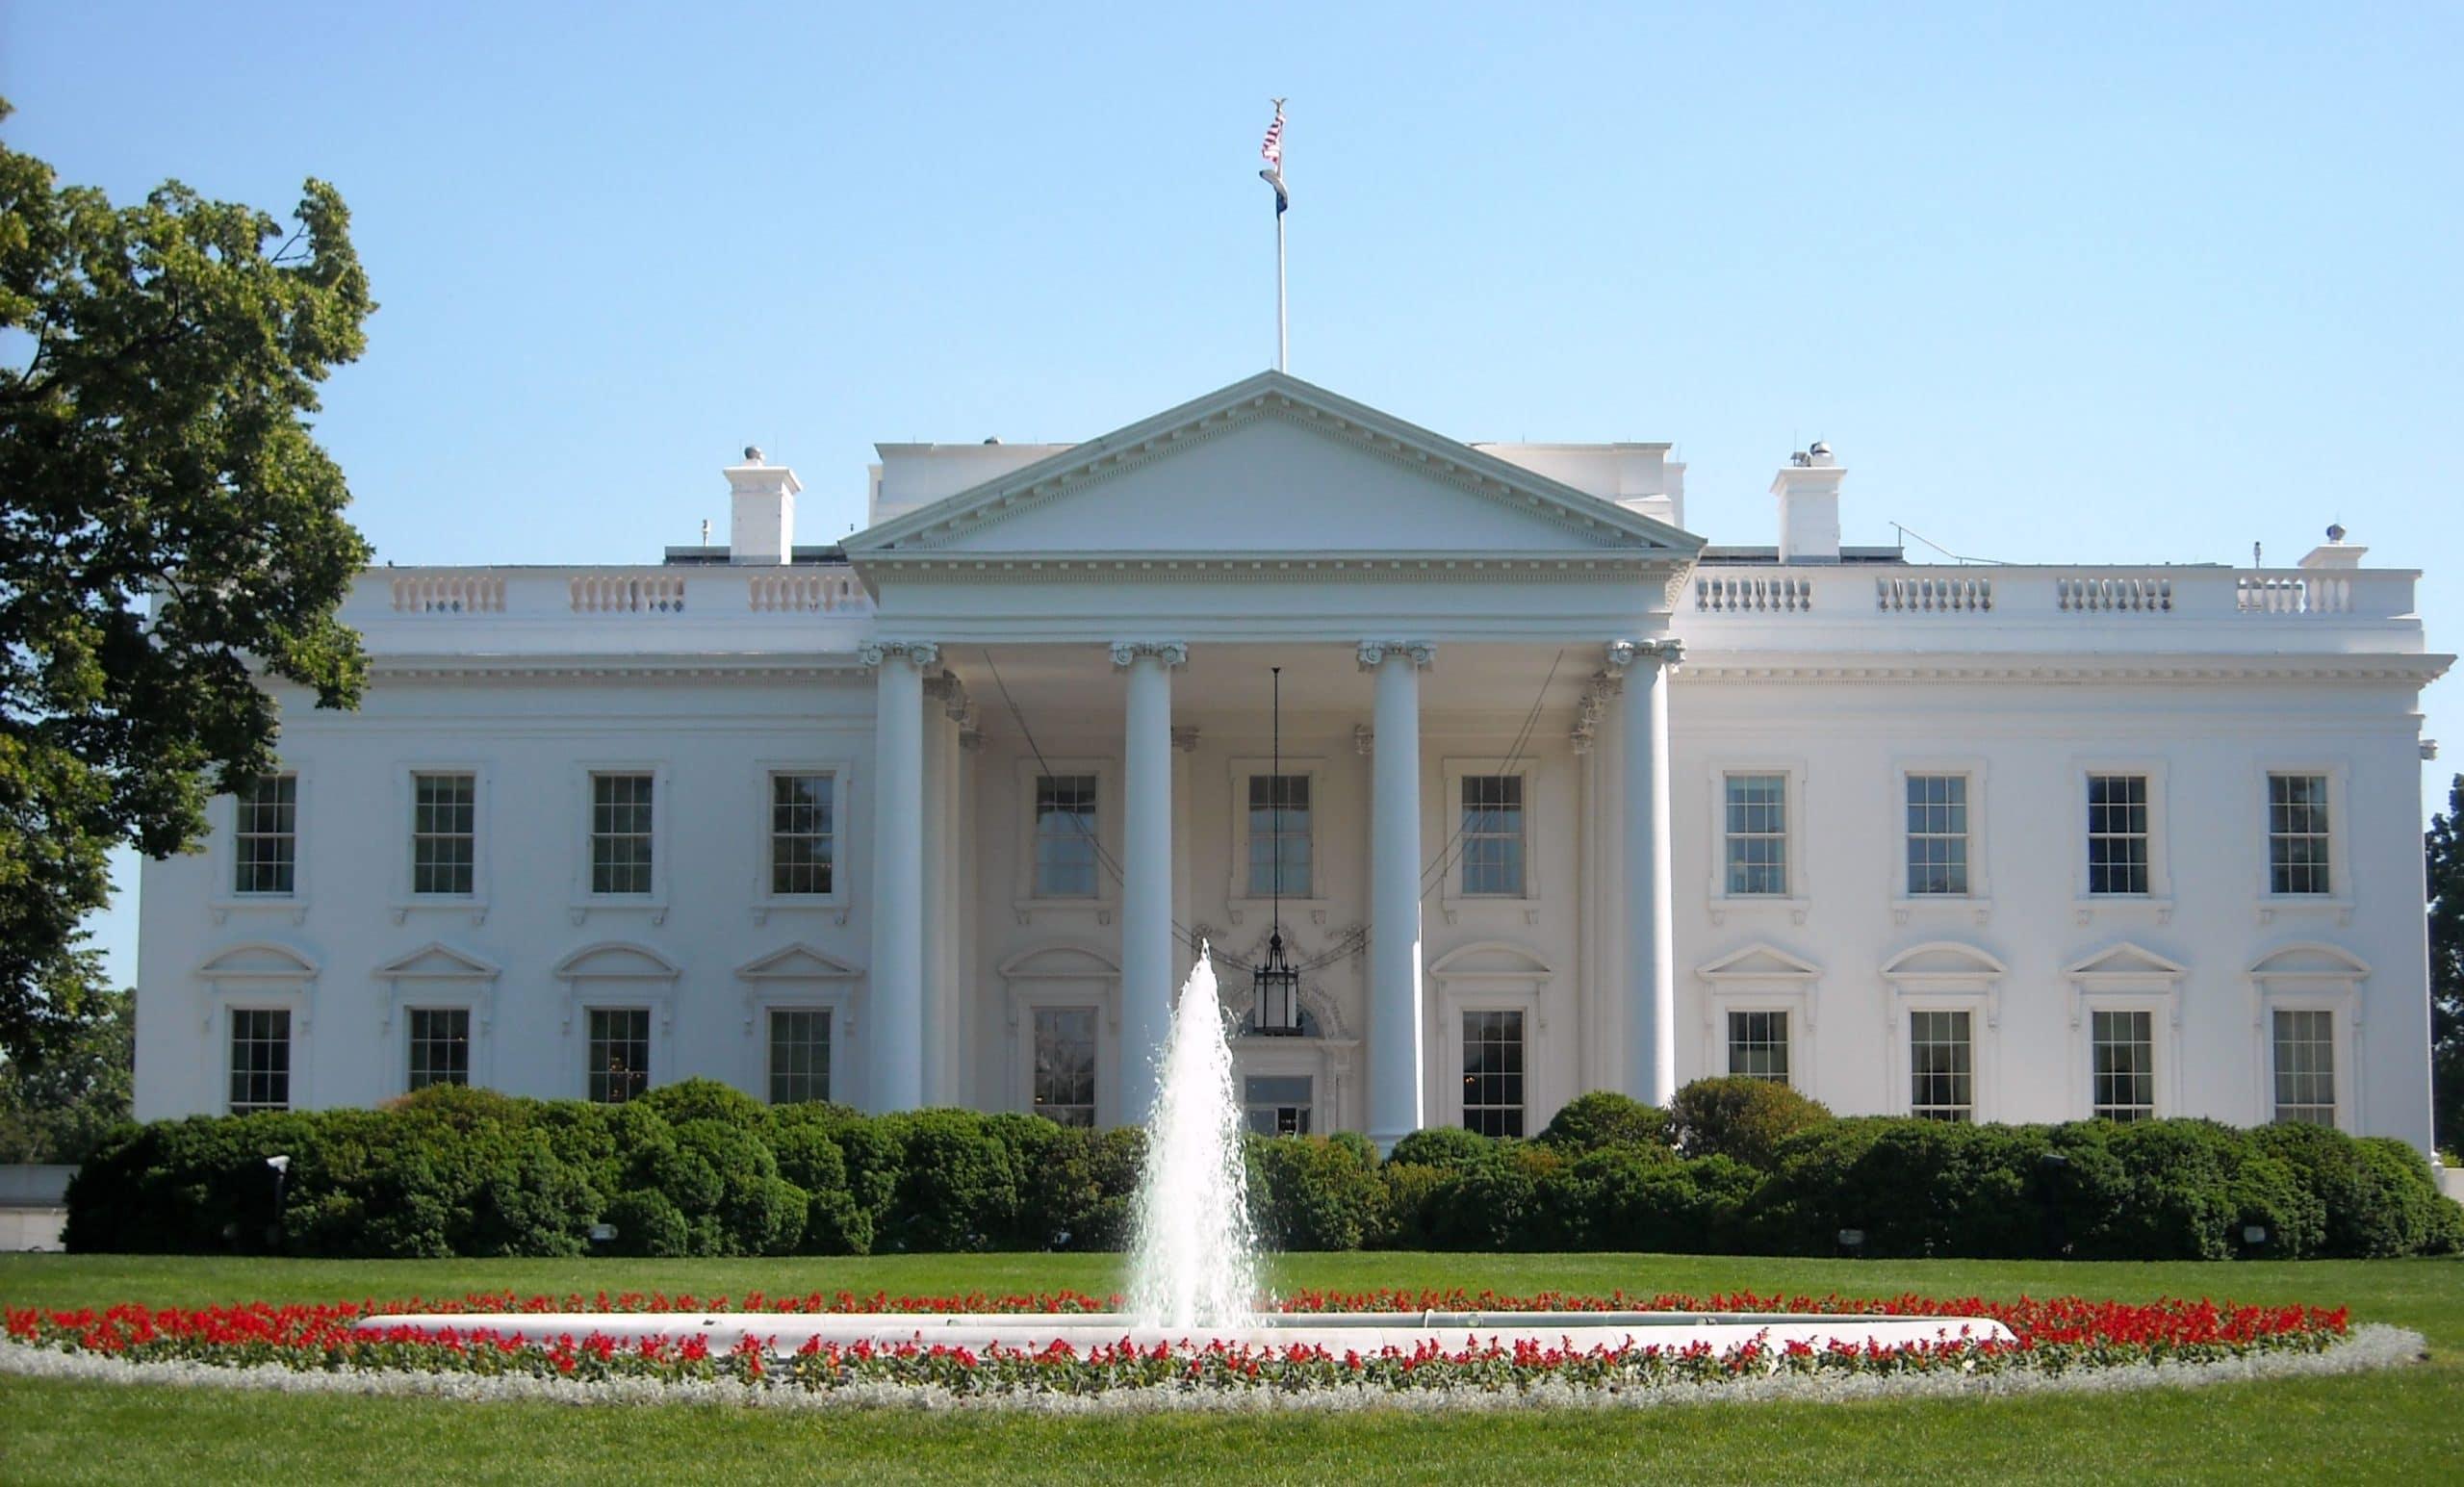 President & White House